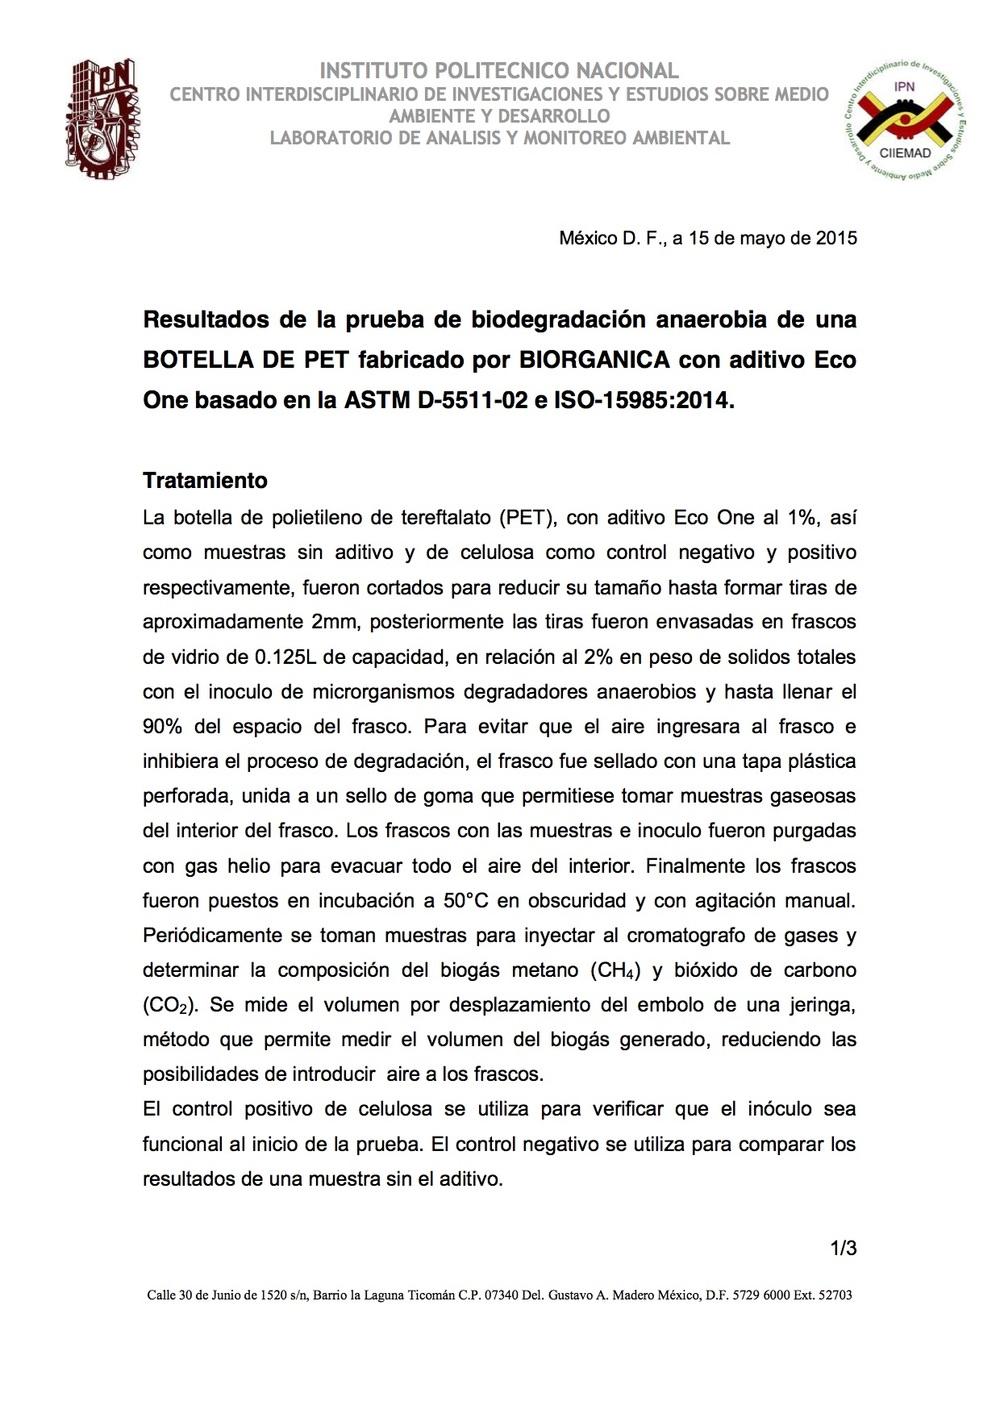 Biodegradación PET Biorganica f pagina 1.jpg